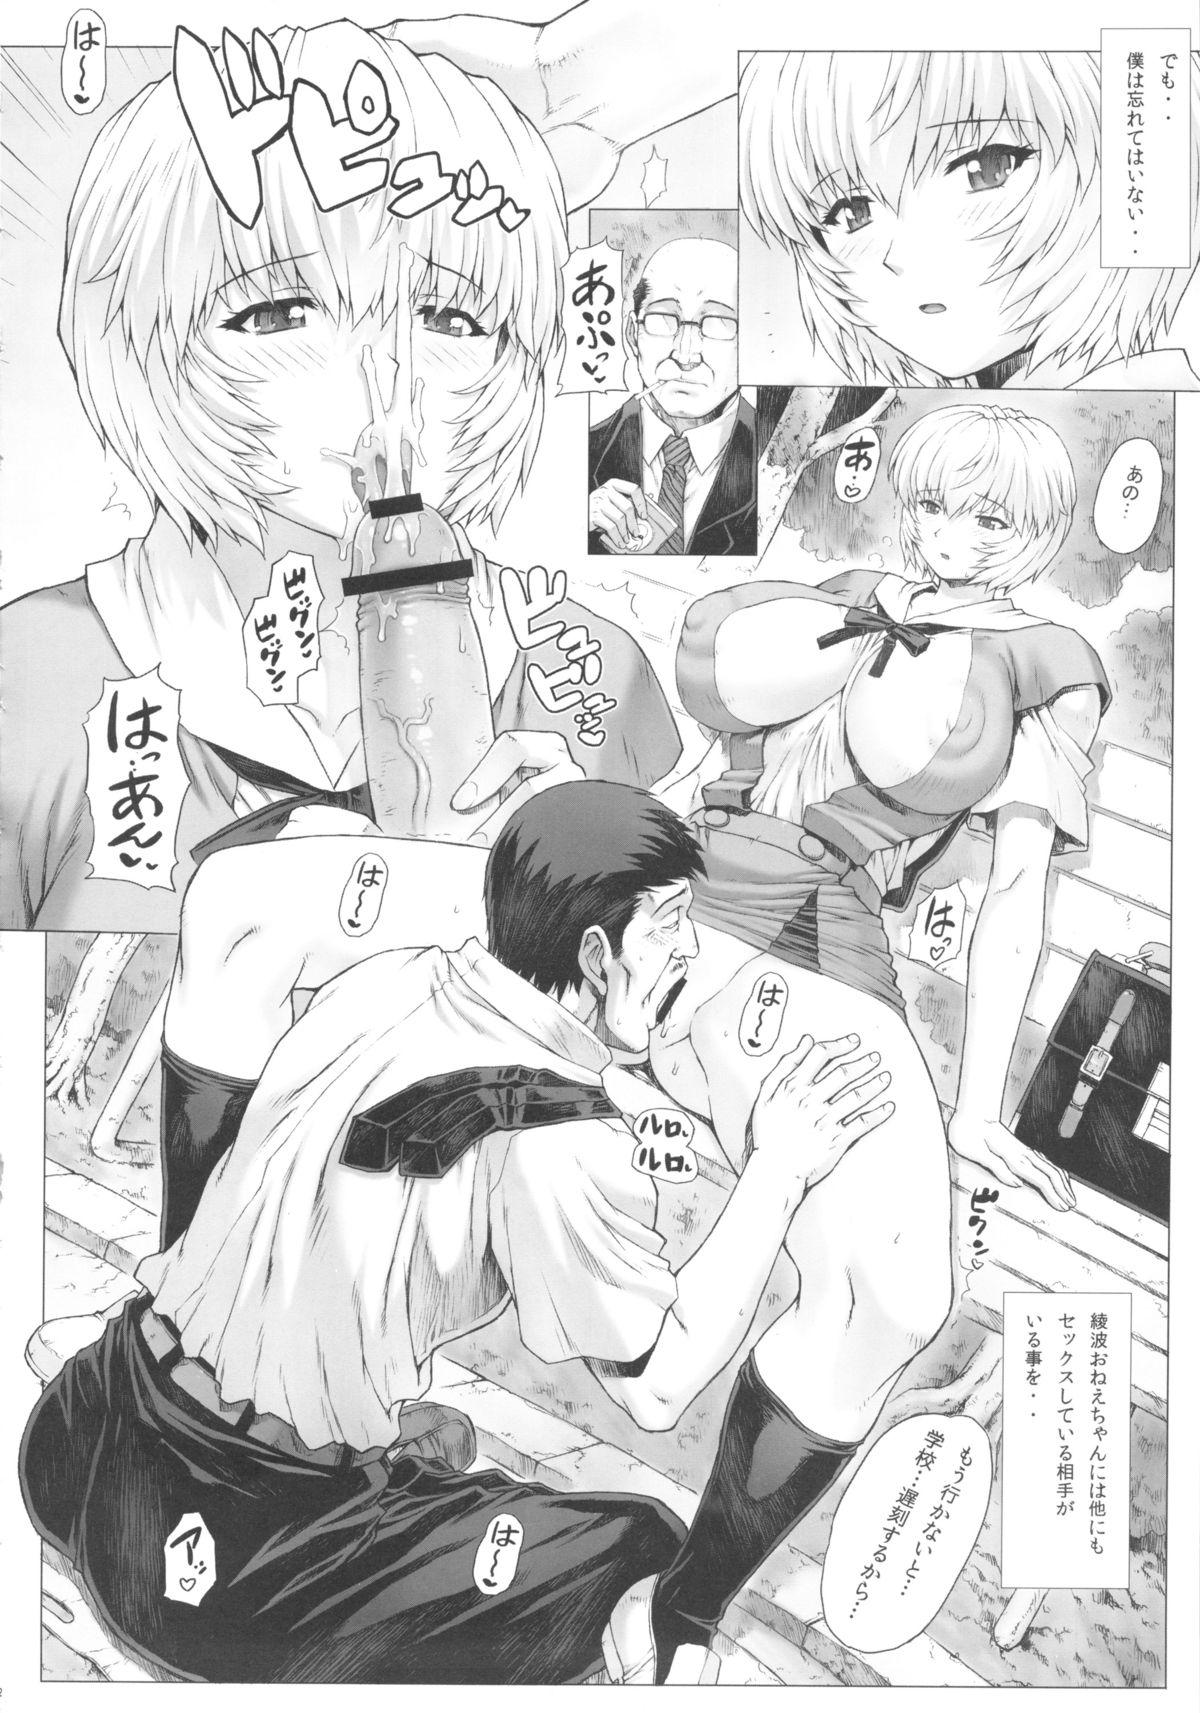 Ayanami Dai 4 Kai + Omake Bon + Postcard 23